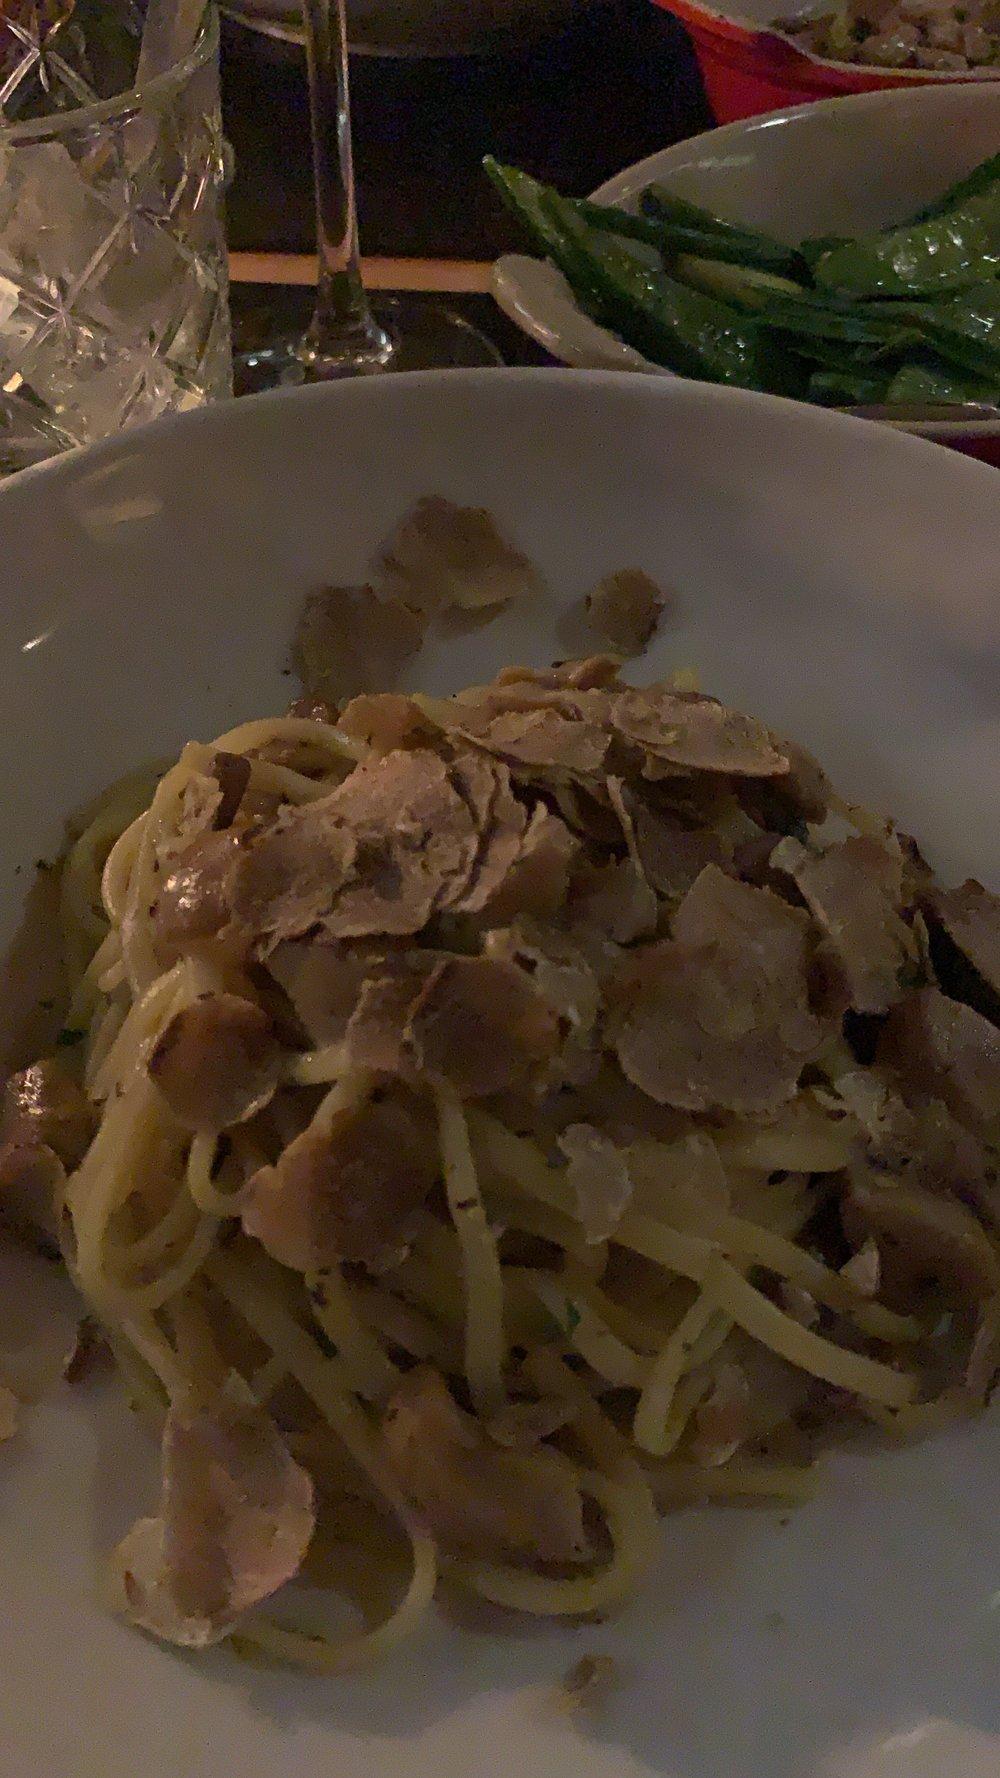 Exquisite truffle pasta at Mama Mia on the Croisette